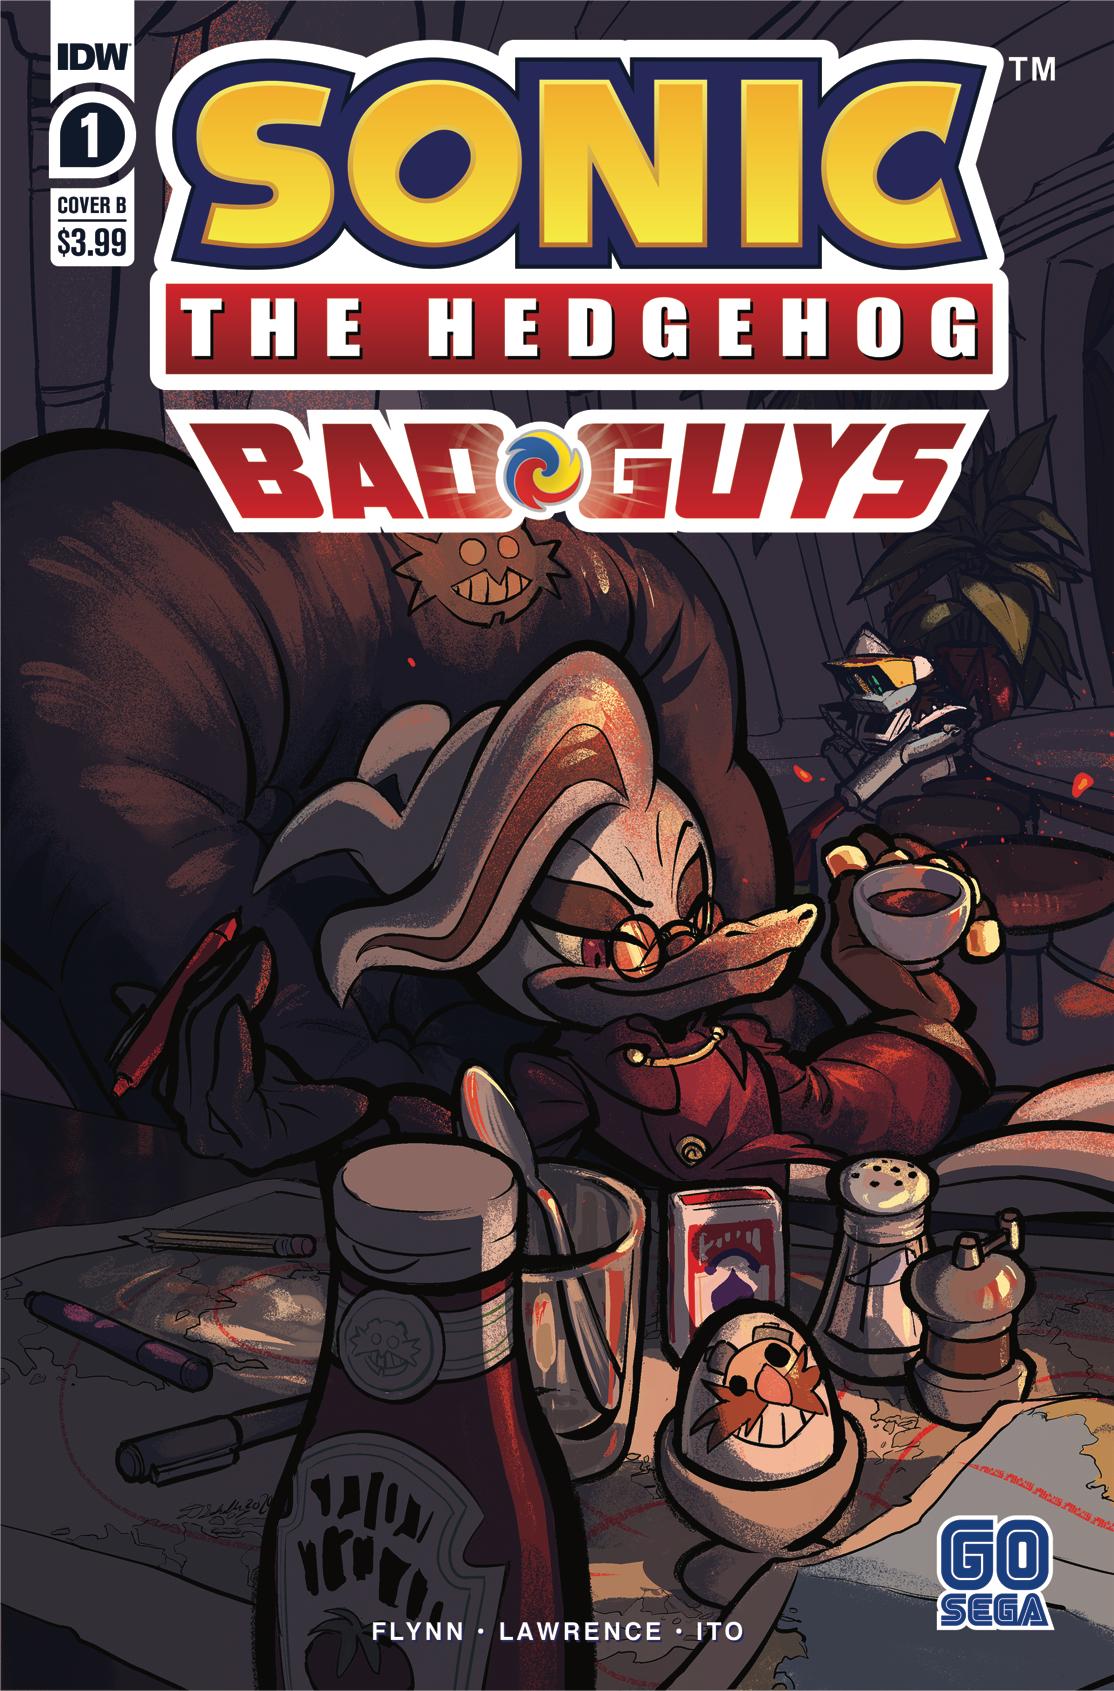 SONIC THE HEDGEHOG BAD GUYS #1 (OF 4) CVR B SKELLY